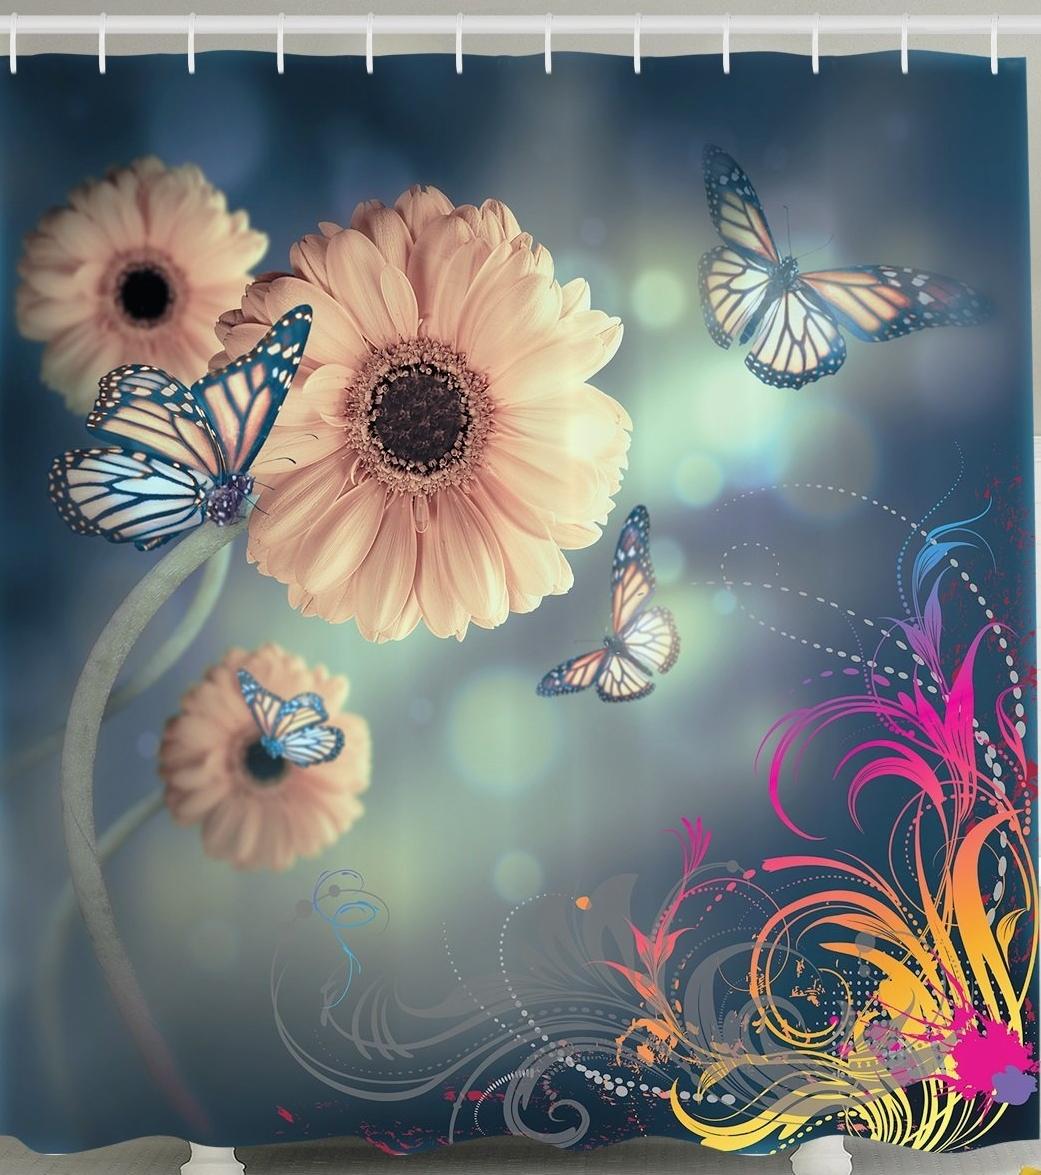 Decor Ombre Garden Fabric Artistic Shower Curtain Gerbera Flowers Decor